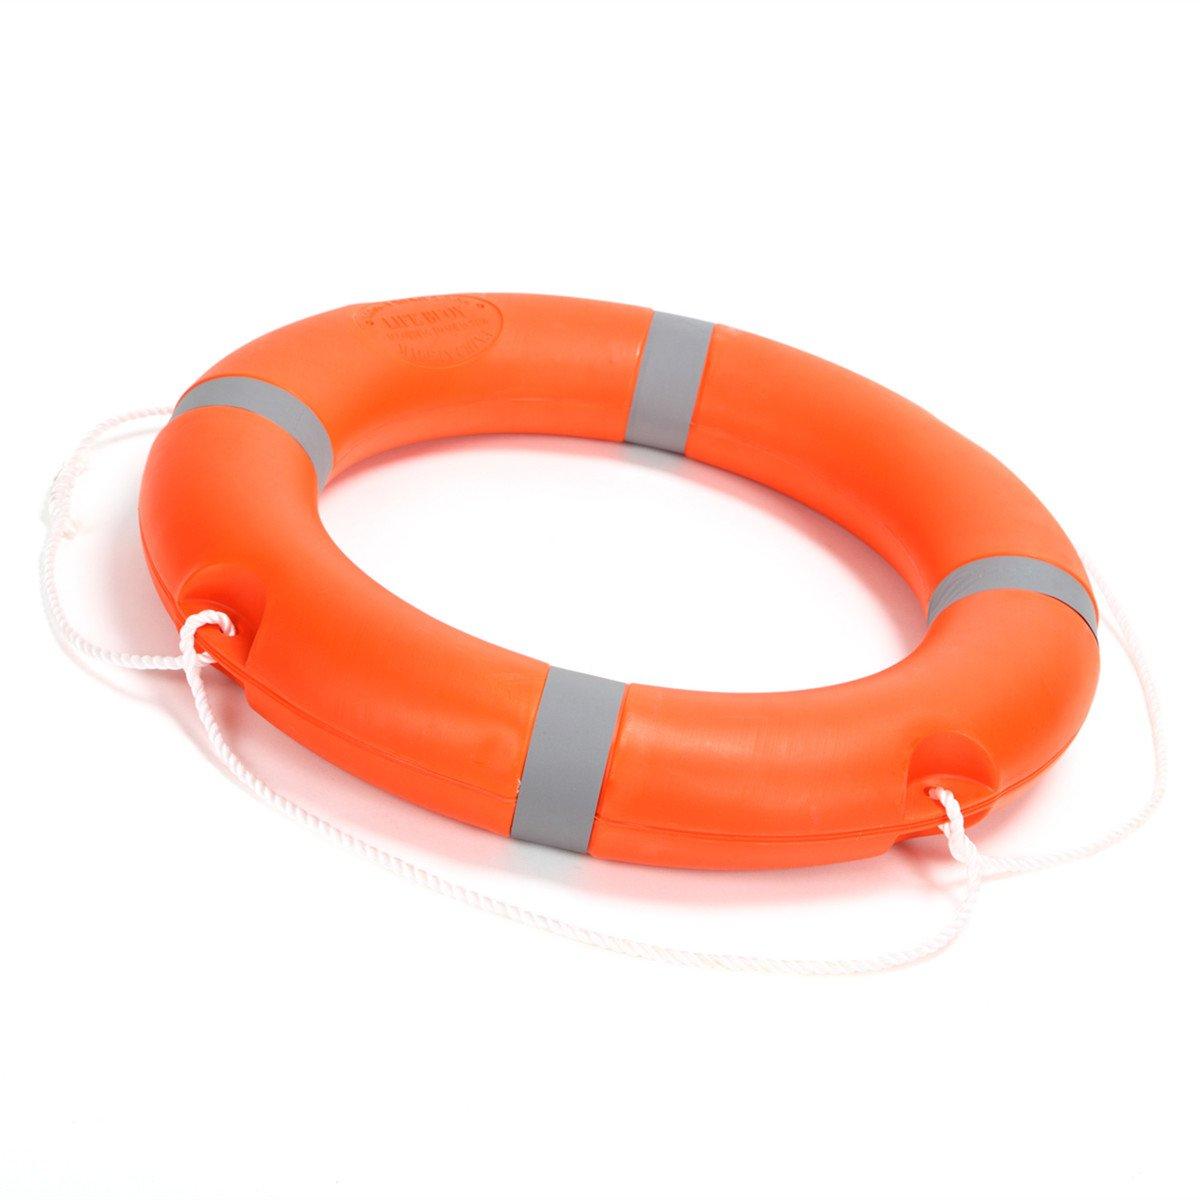 BeautySu. 28'' Diameter Professional Adult Foam Swim Ring Buoy Orange Lifering with White Bands by BeautySu. (Image #6)